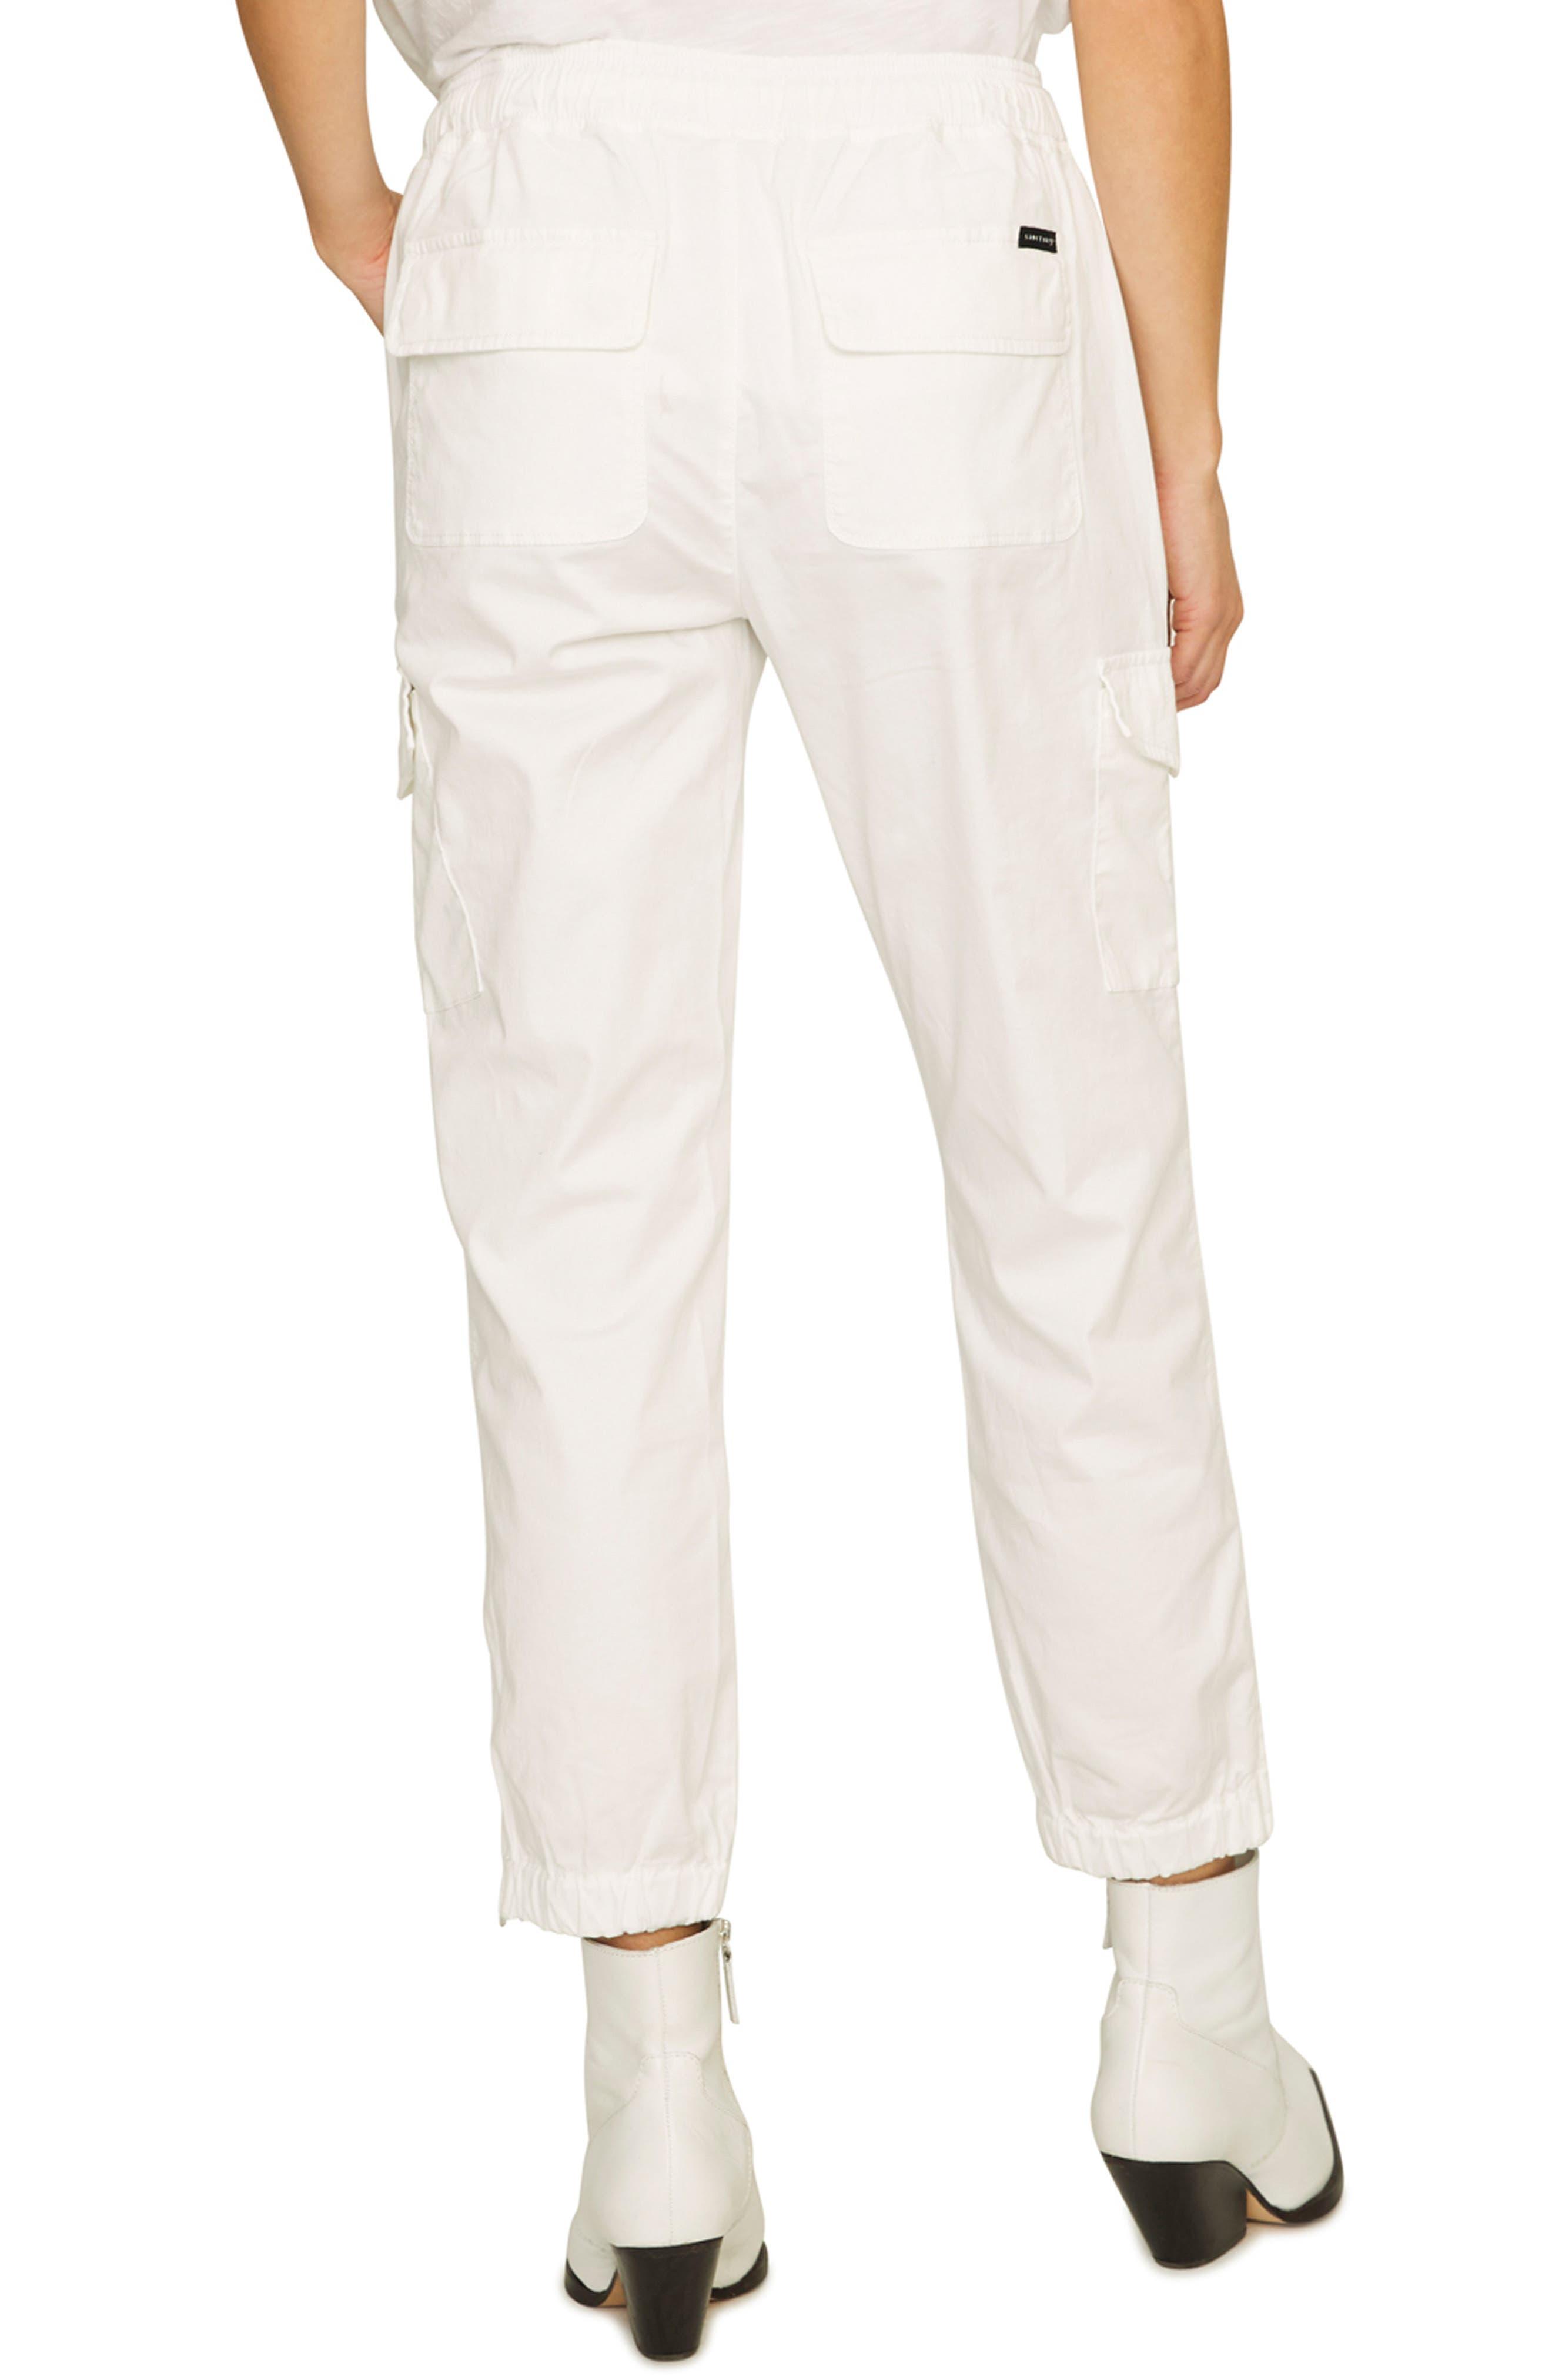 SANCTUARY, Drawstring Trooper Pants, Alternate thumbnail 2, color, BRITE WHITE